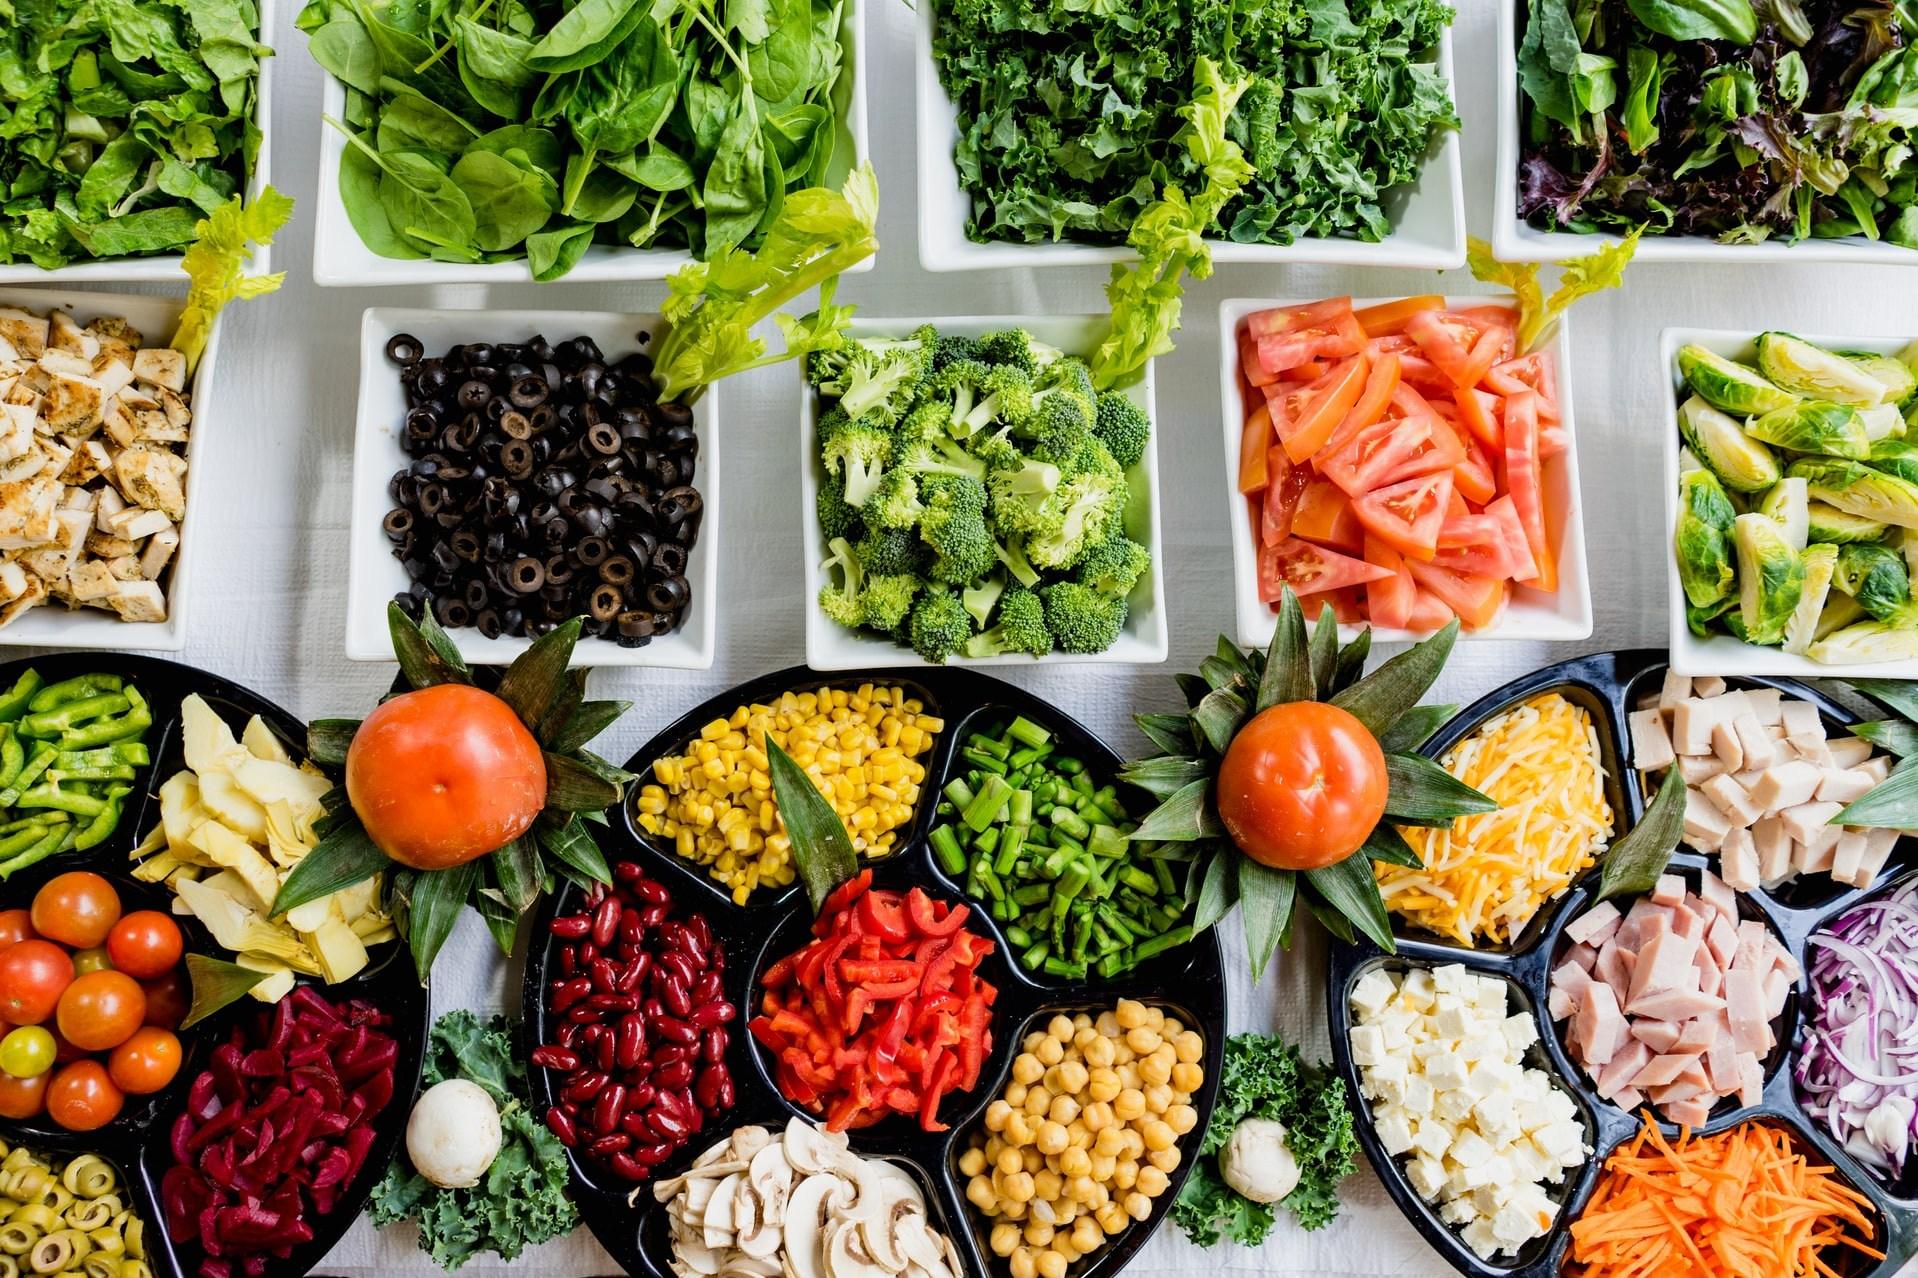 Hari Pangan Sedunia Untuk Anak Kost Yuk Tingkatin Gizi Makan Kamu Mamikos Info